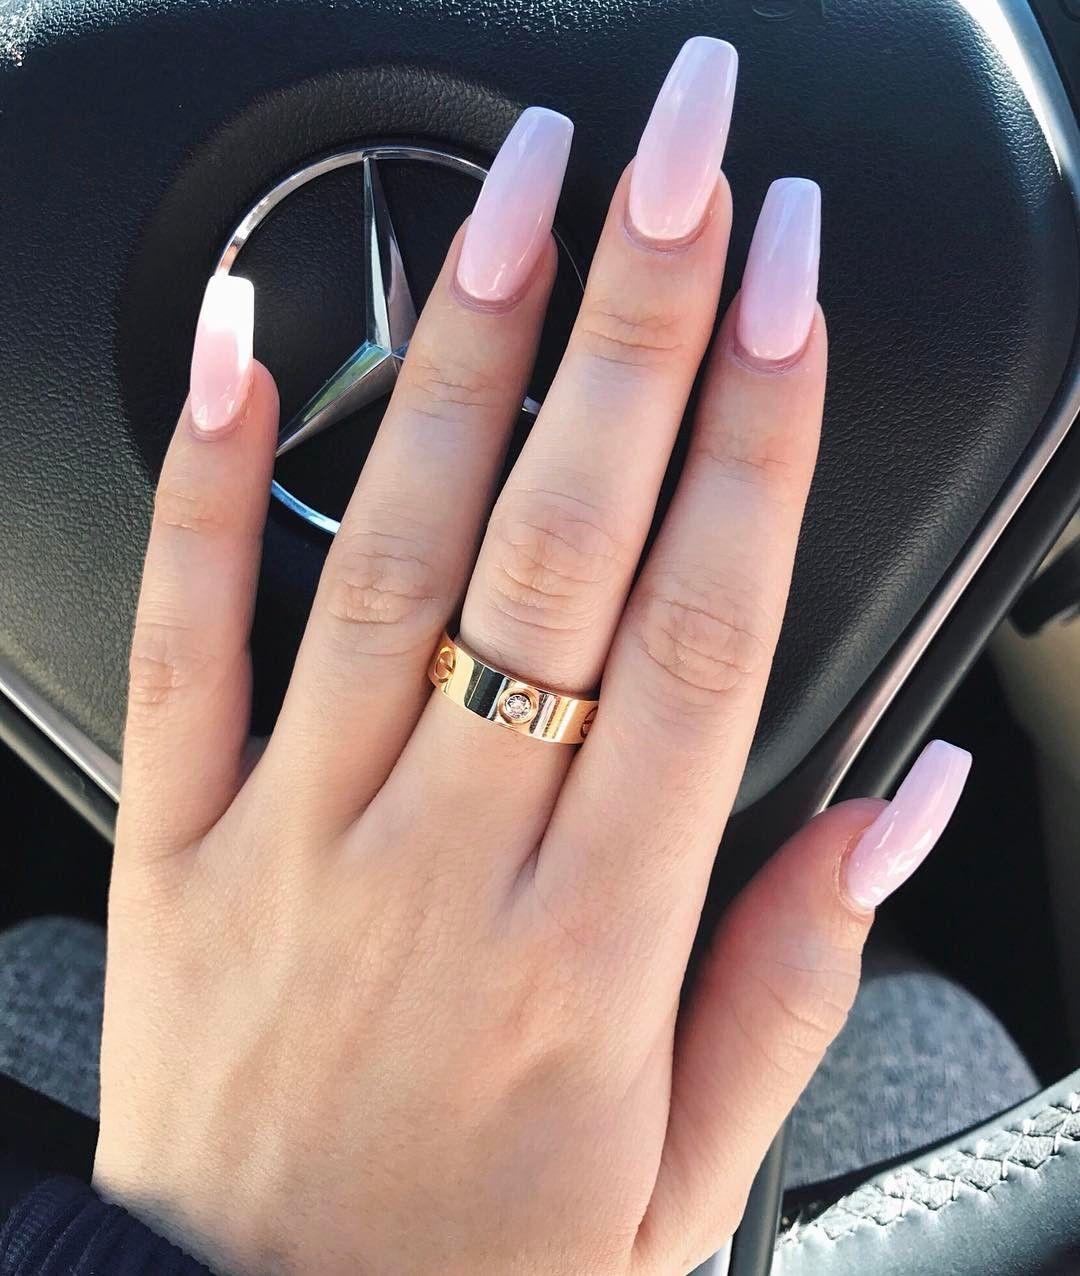 Pin de Jouckje Welleman en nails | Pinterest | Diseños de uñas ...